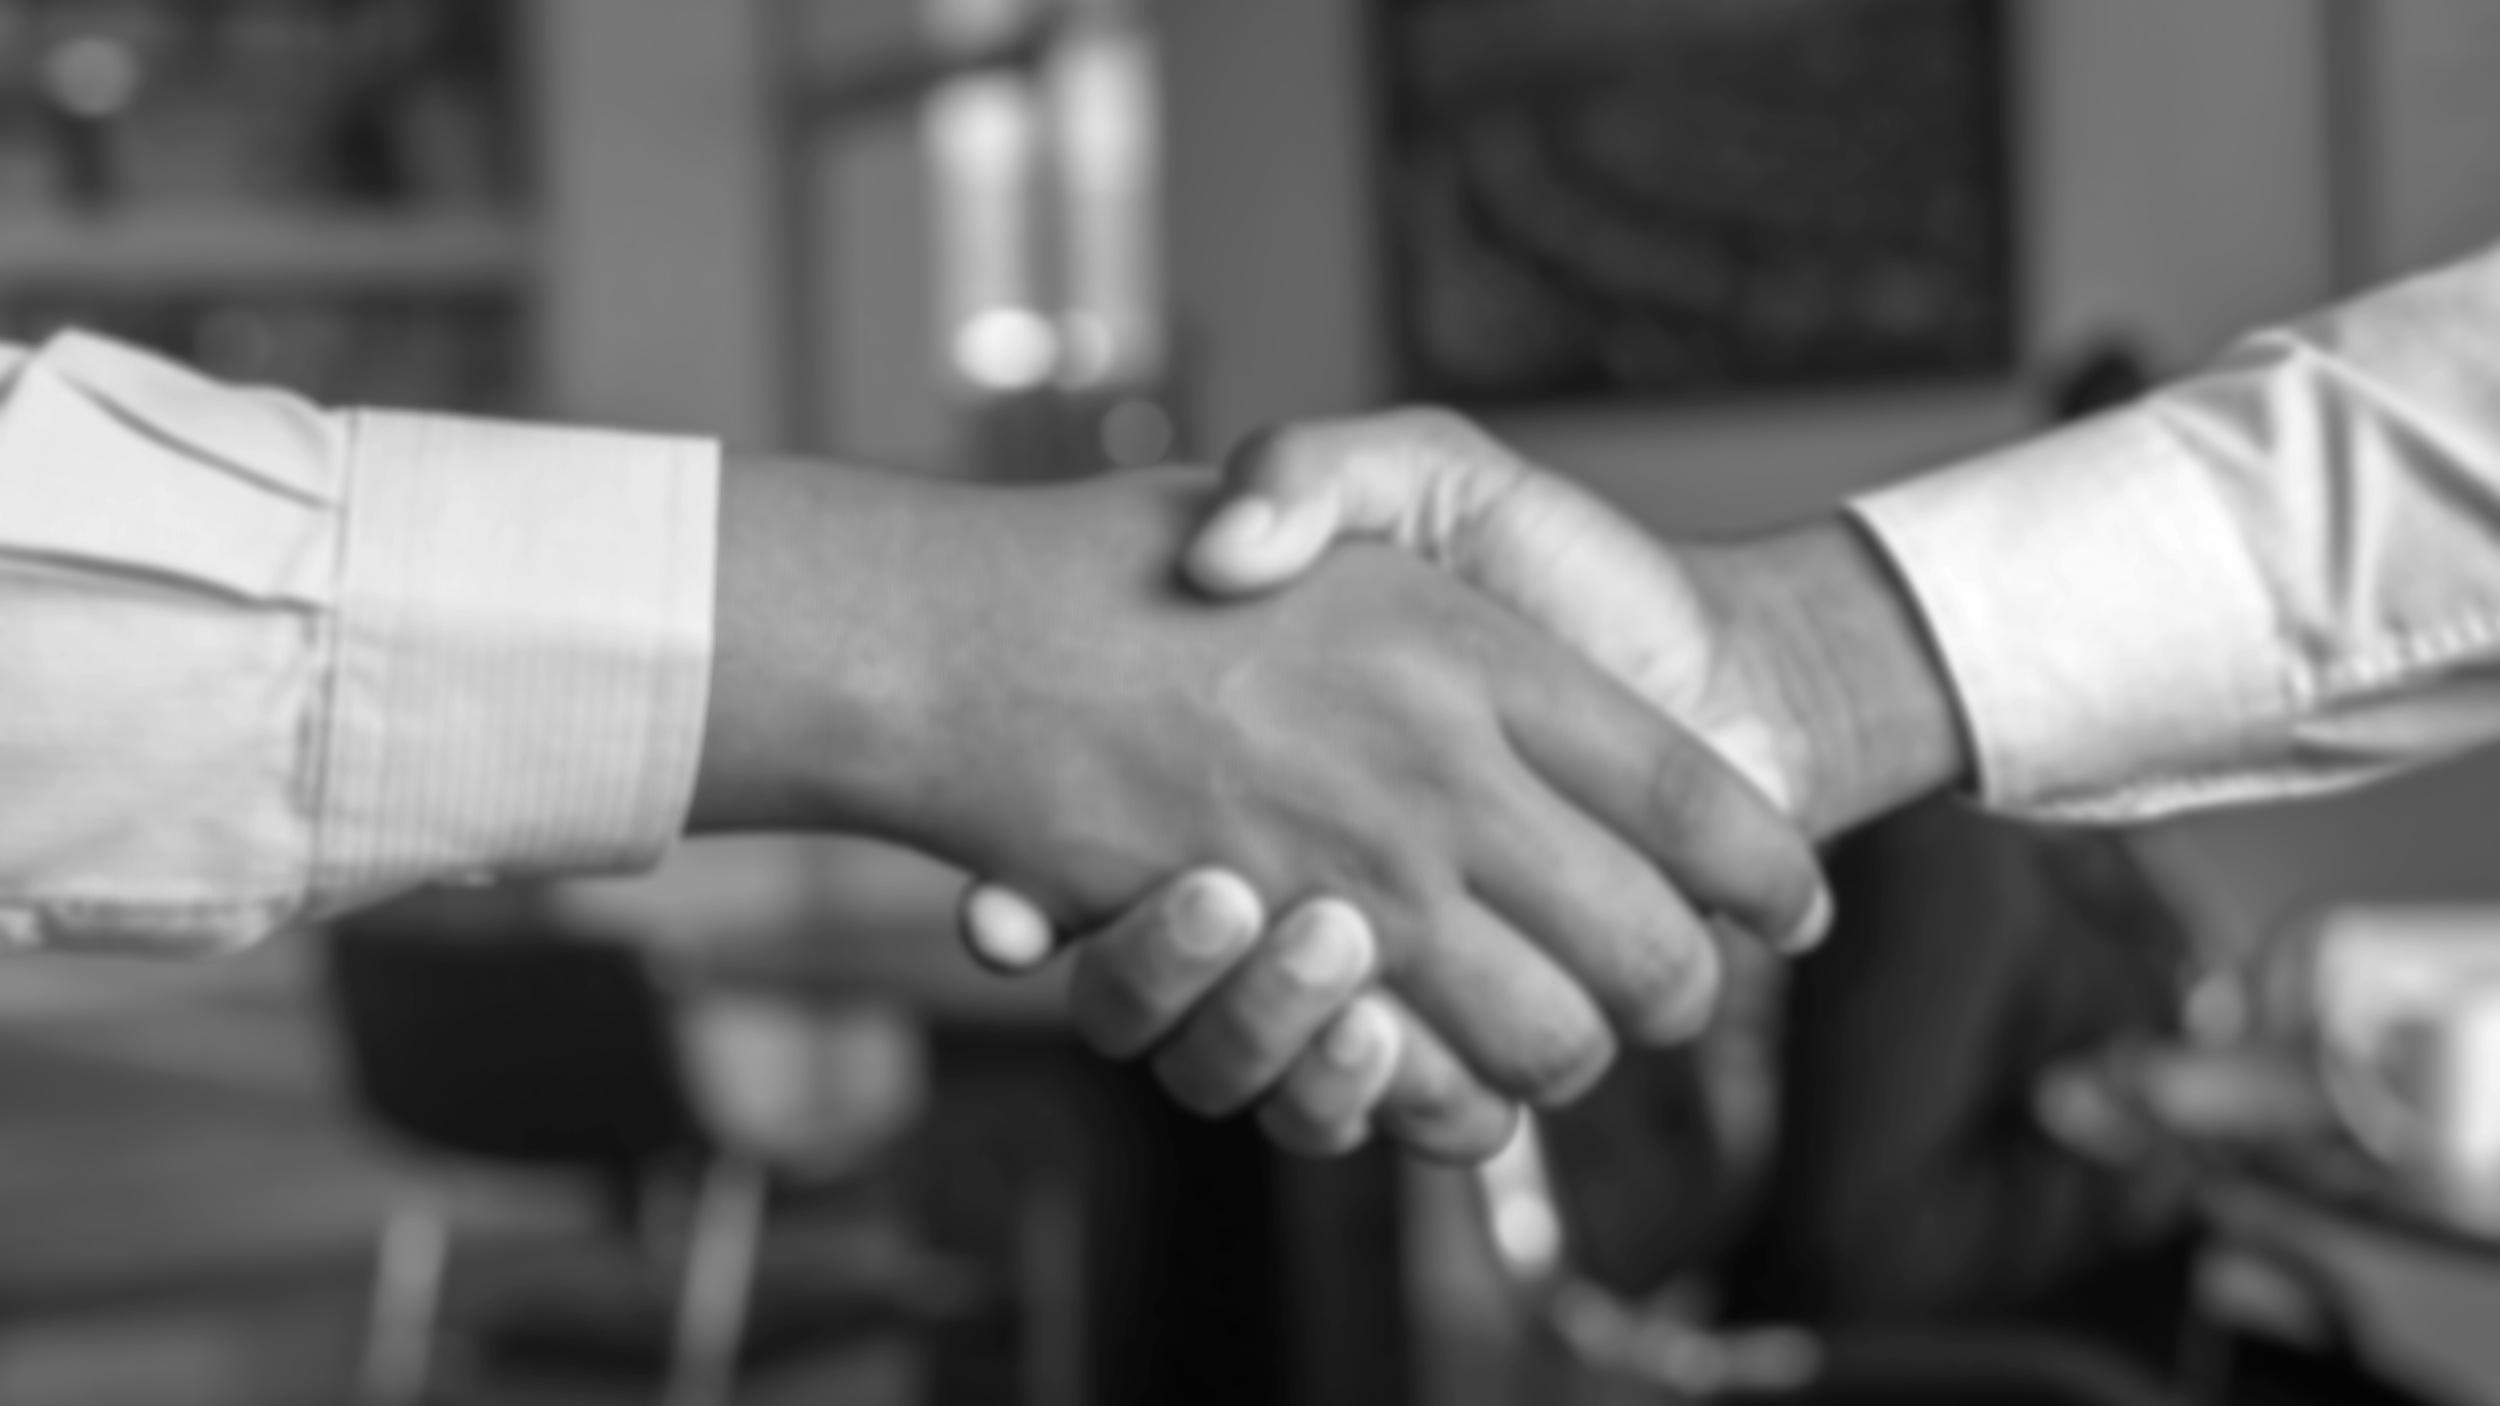 Charity Partnership Project - IN PROGRESS